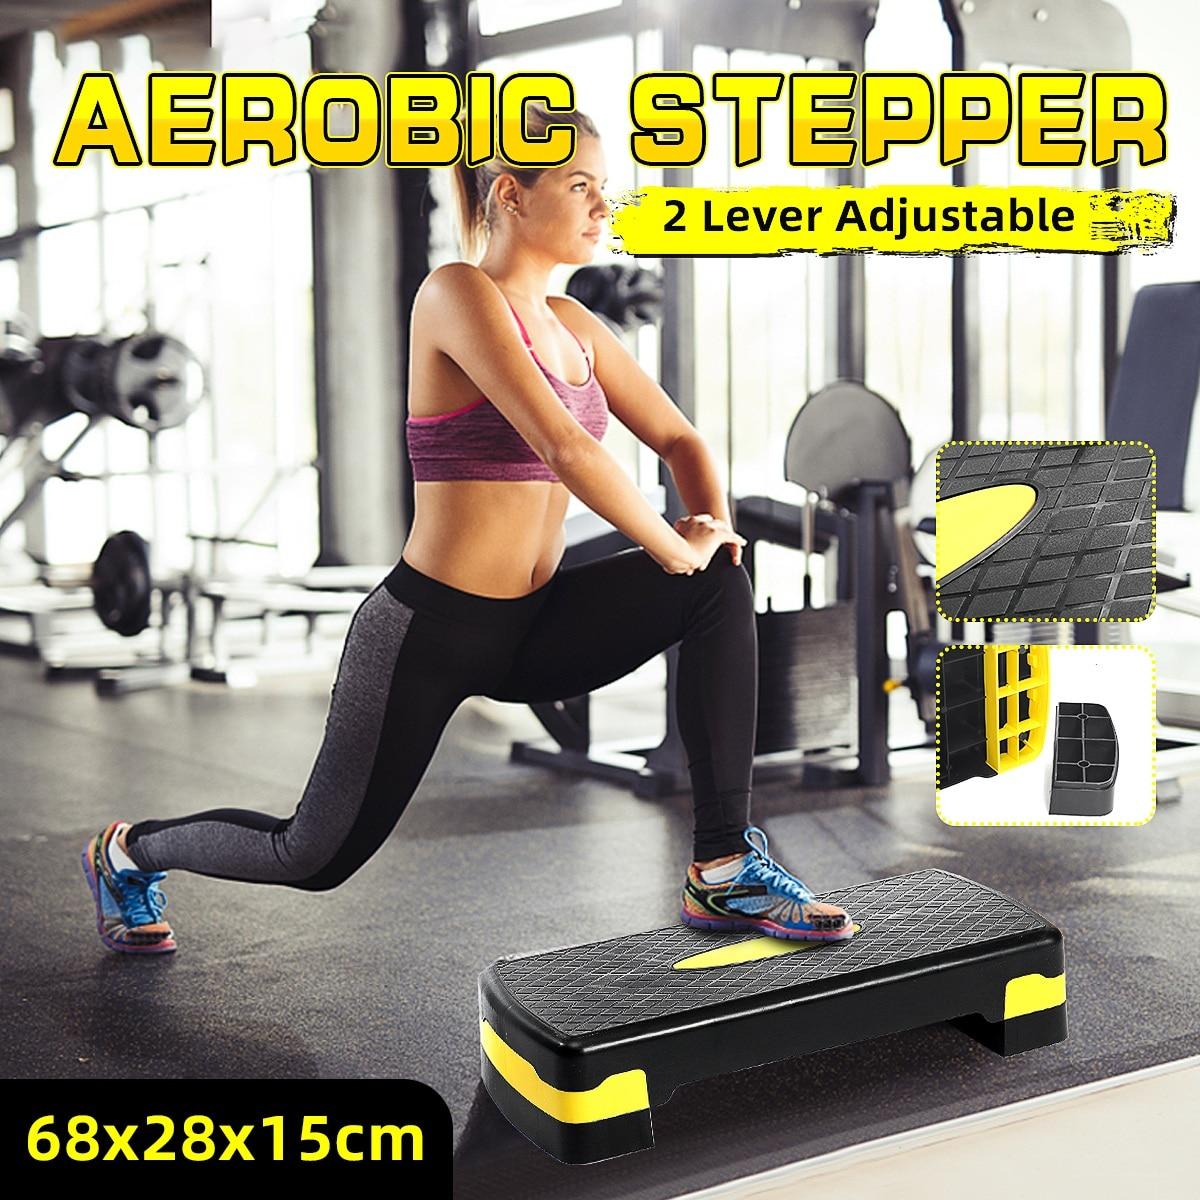 Fitness Aerobic Step Adjustable Non-slip Cardio Yoga Pedal Stepper Gym Workout Exercise Fitness Aero